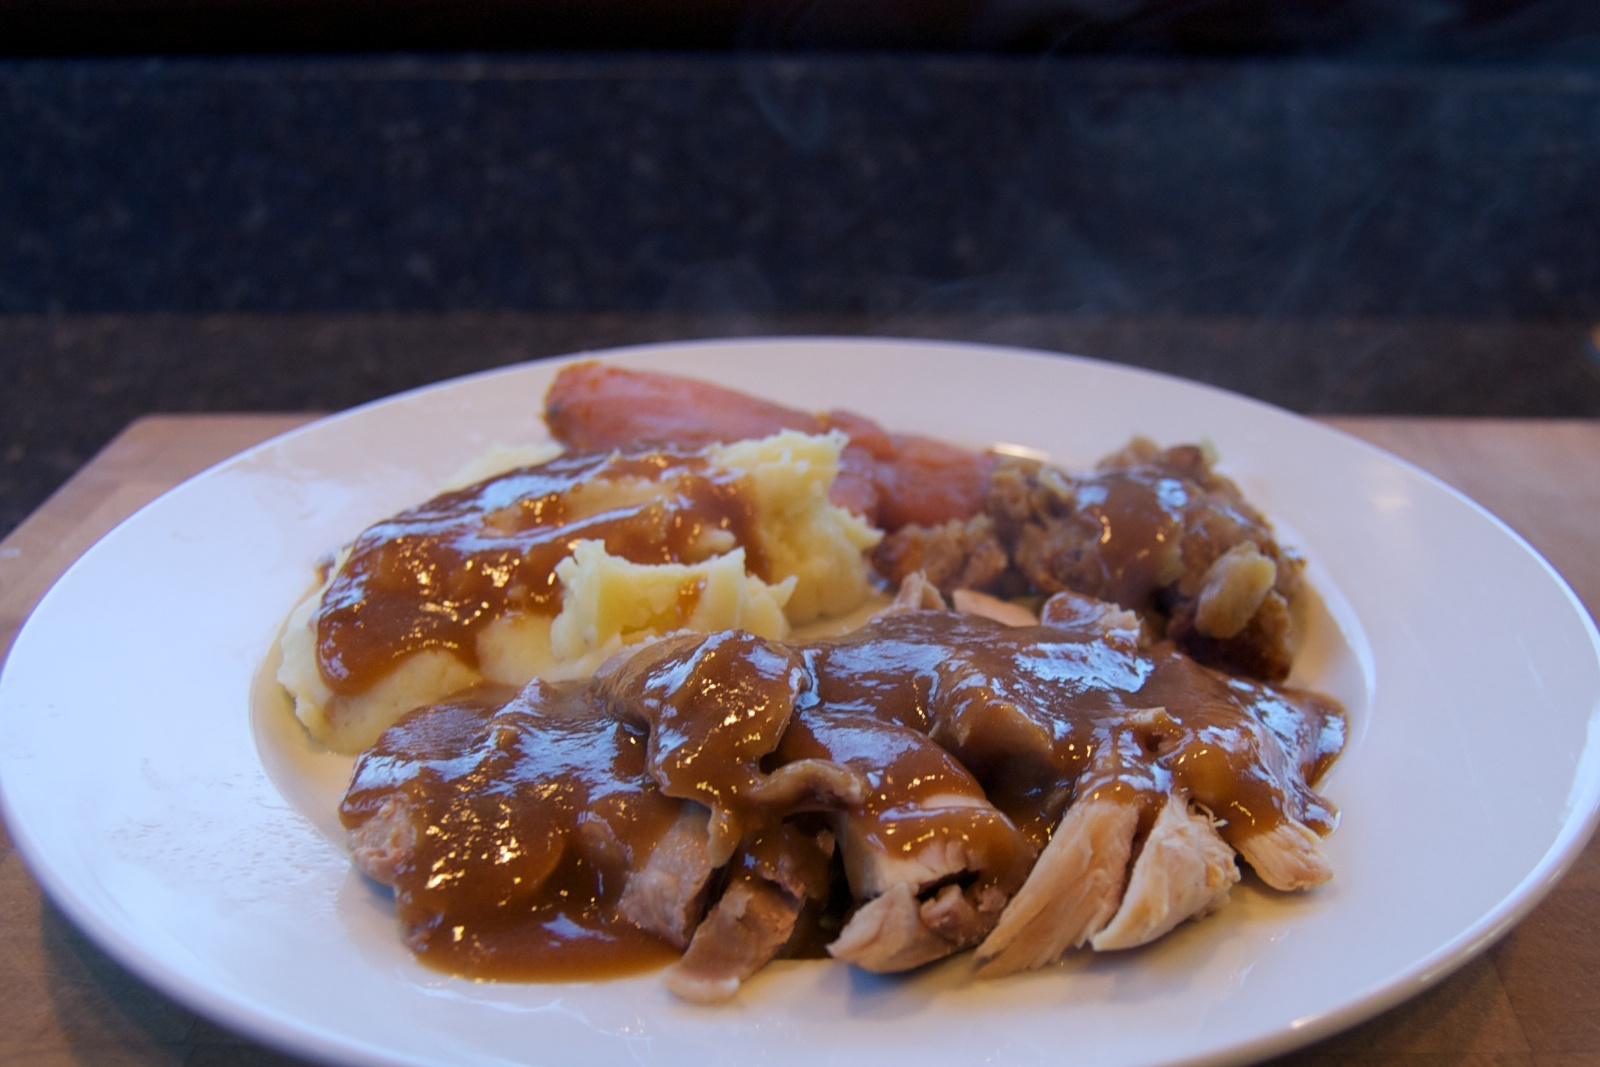 http://blog.rickk.com/food/2012/12/13/ate.2012.12.13.d.jpg